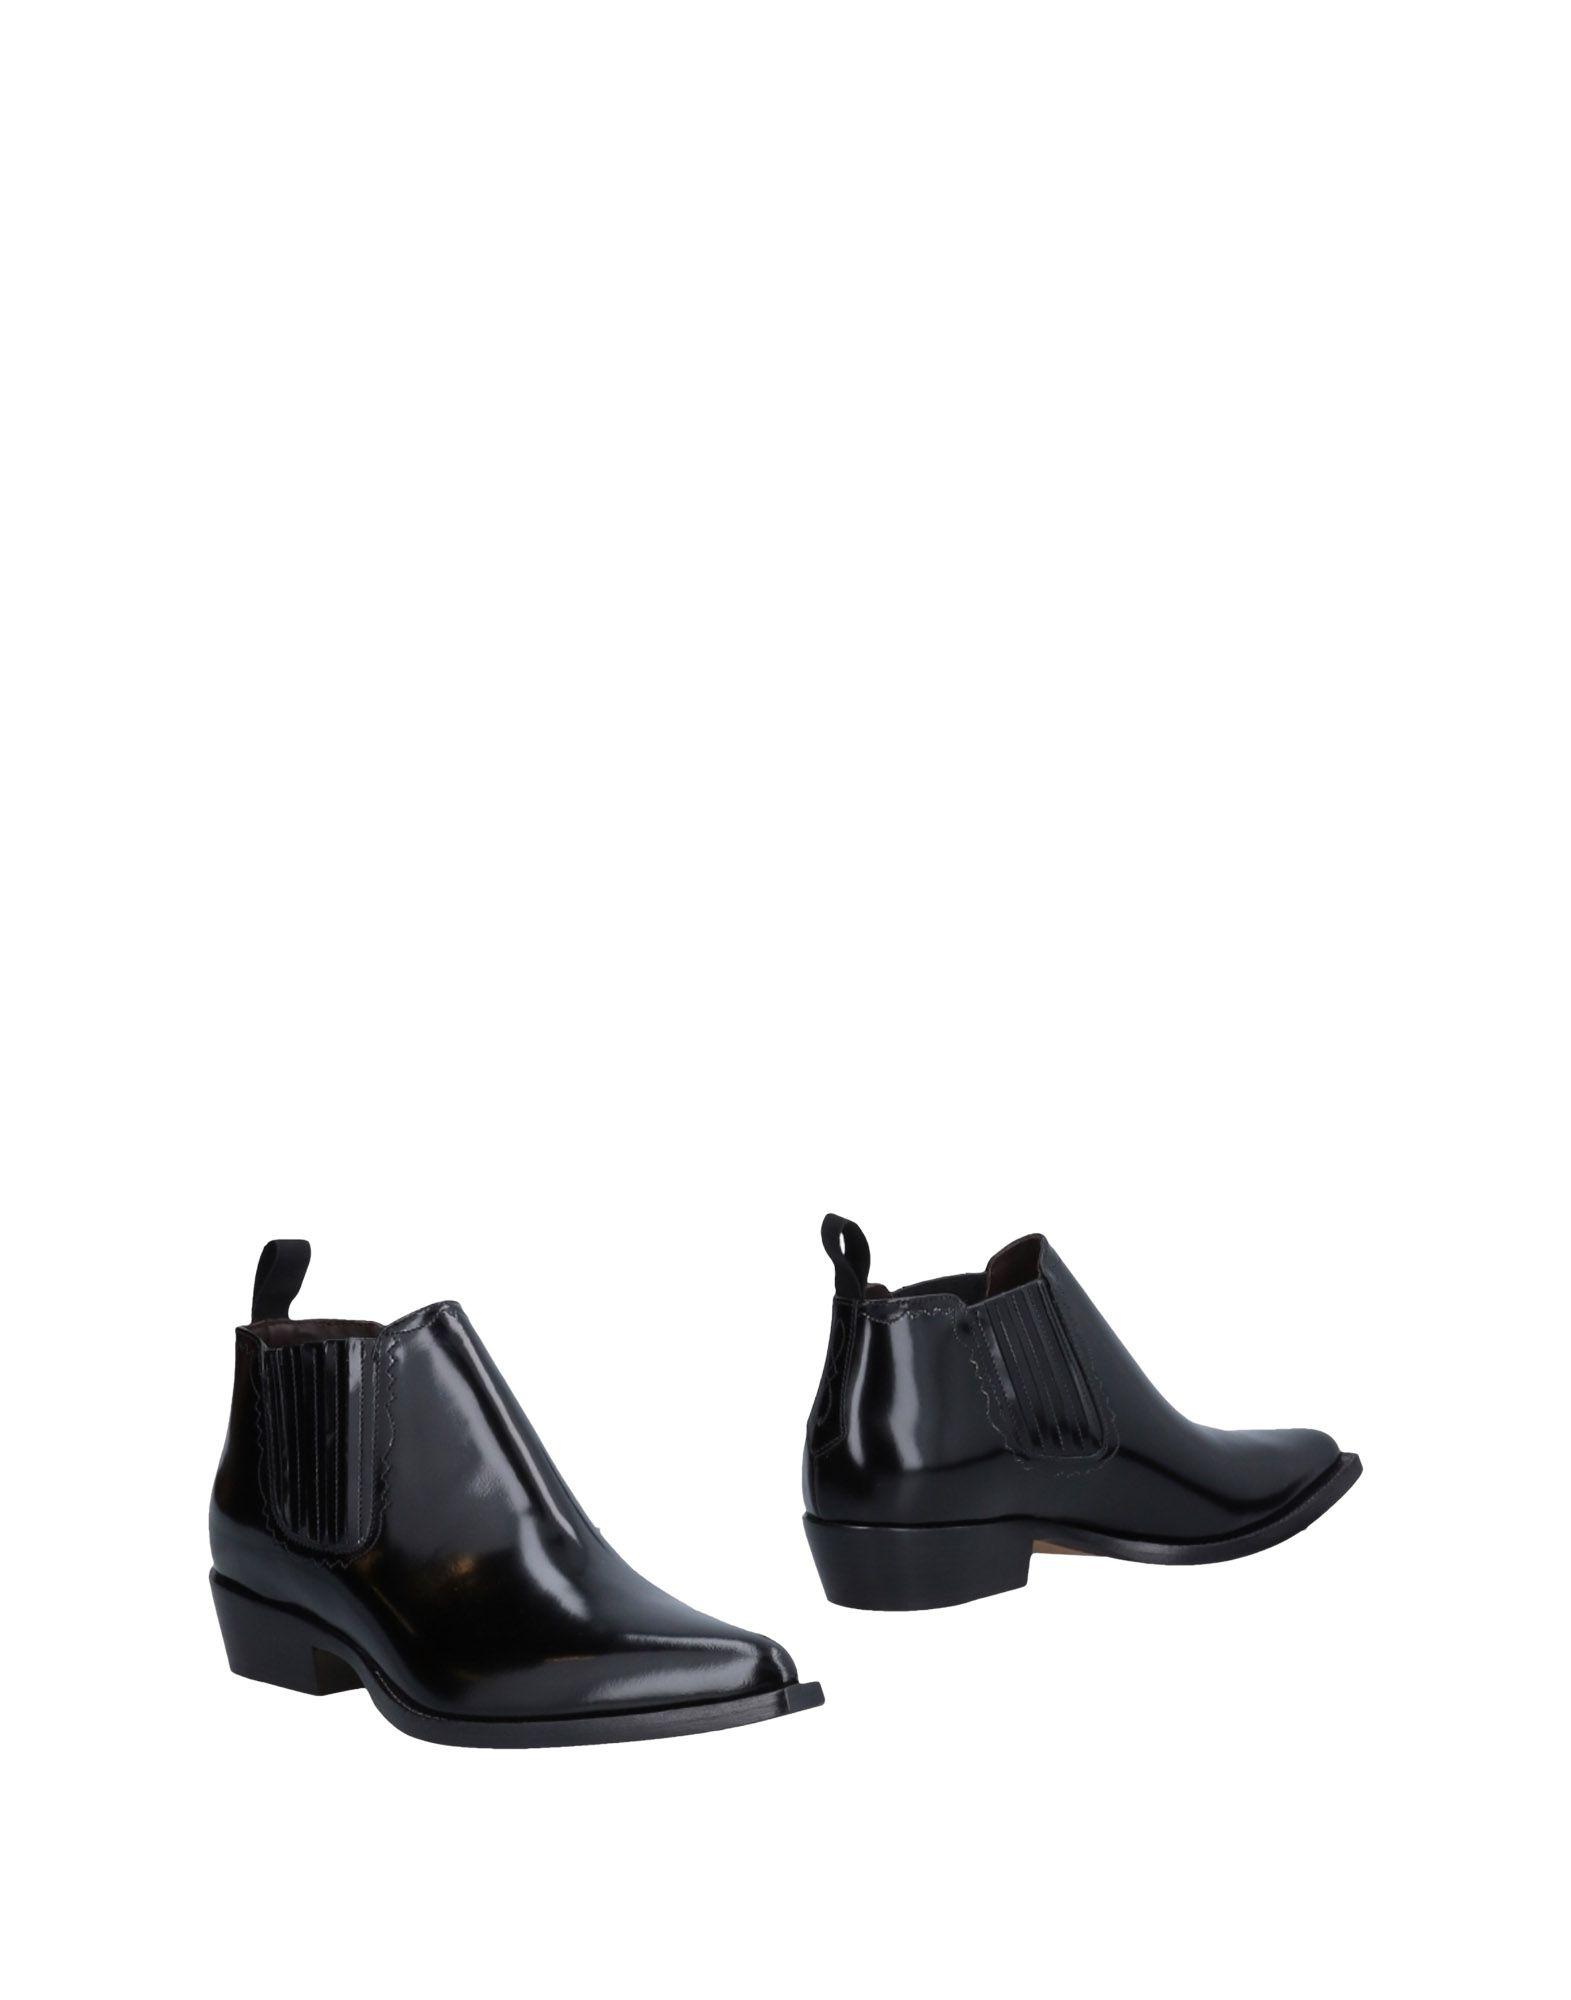 Sonora Ankle Boot - Women Women Women Sonora Ankle Boots online on  United Kingdom - 11486563LK 125c69